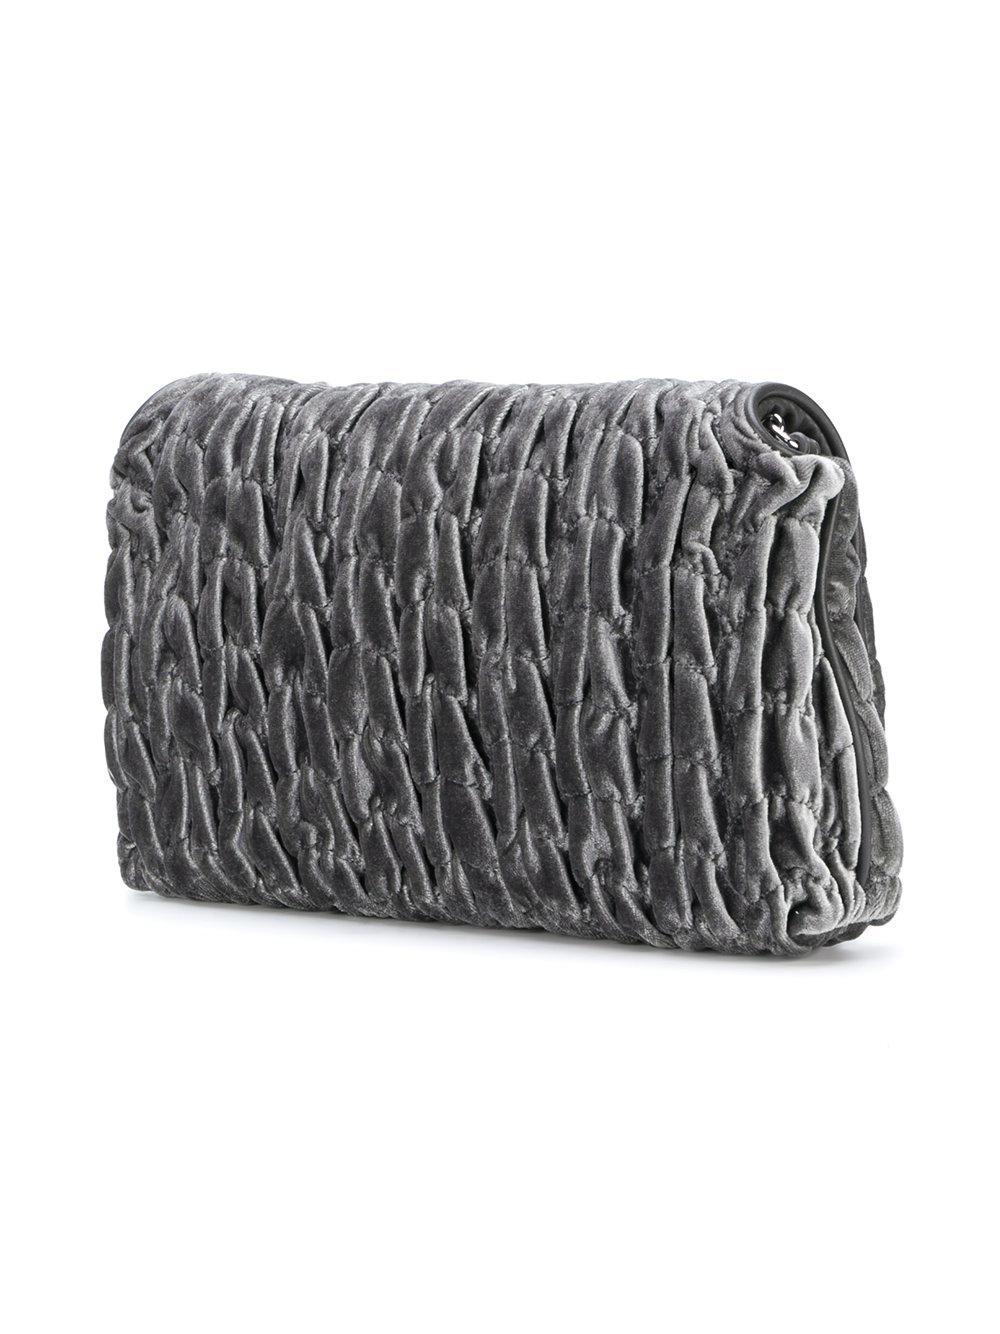 Love Moschino Velvet Textured Cross Body Bag in Grey (Grey)